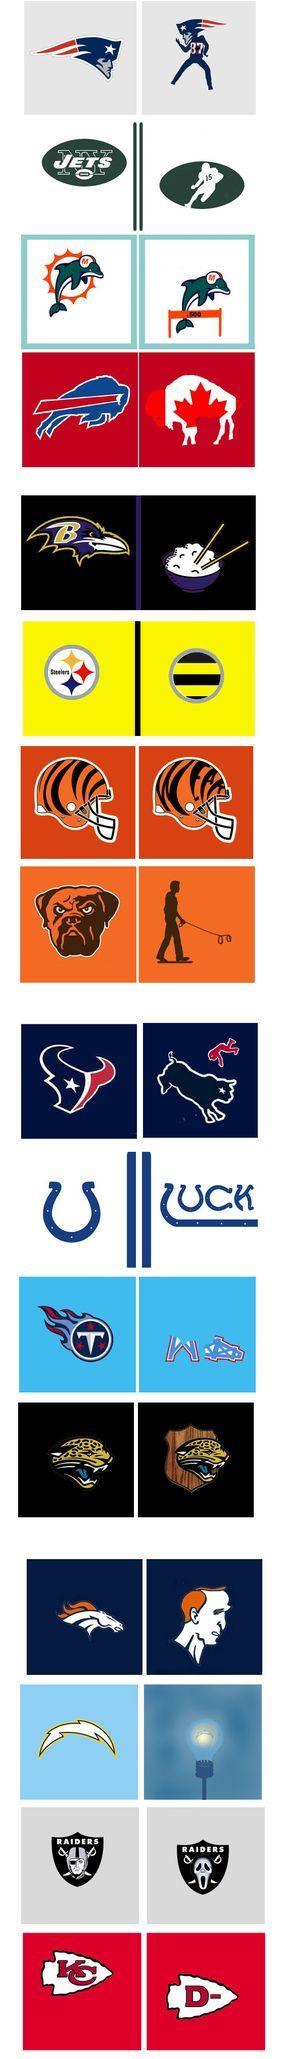 Kurt Snibbe's AFC logo makeovers